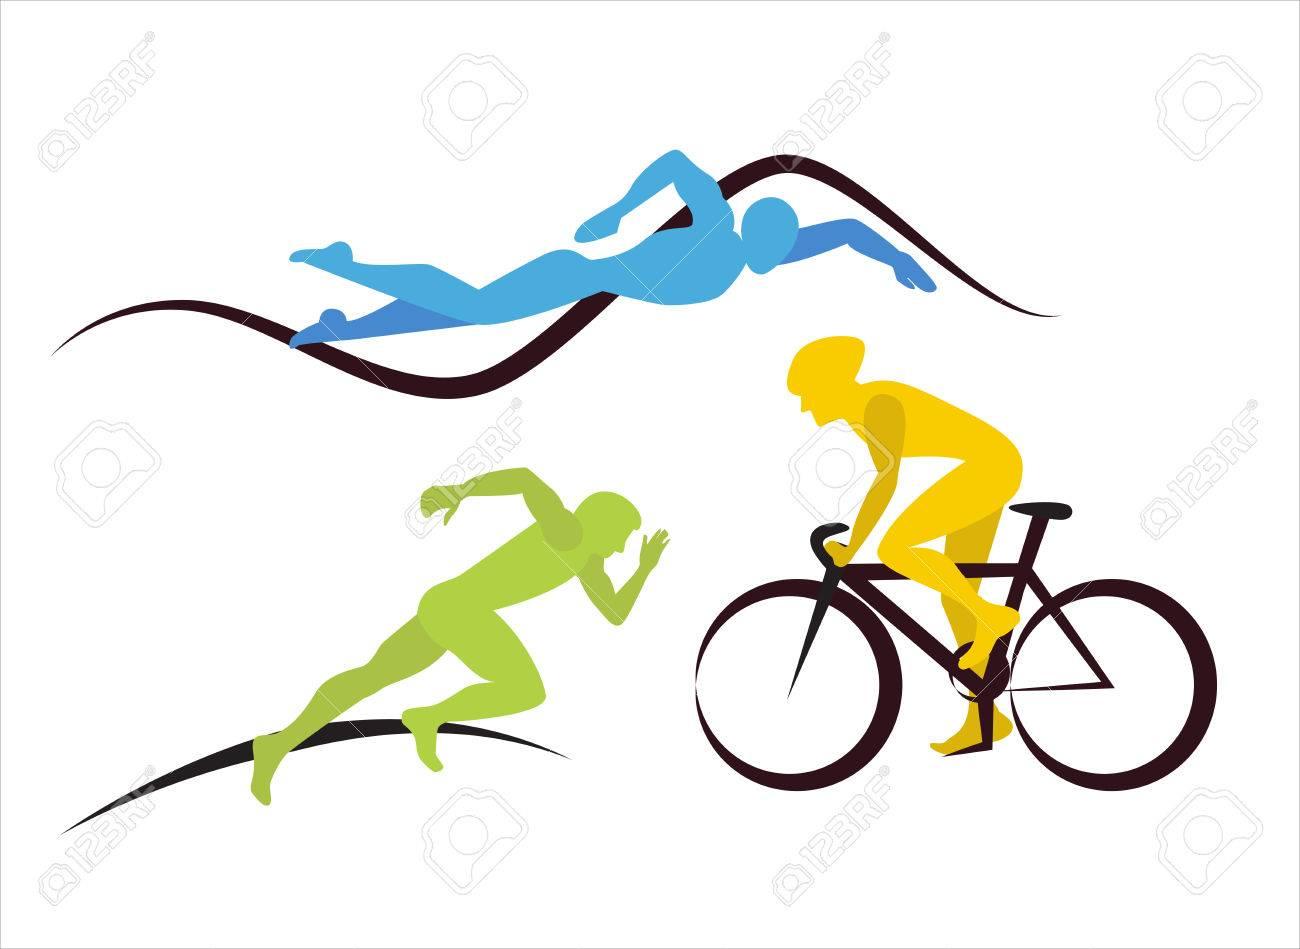 three triathlon athletes icons for triathlon and other spot